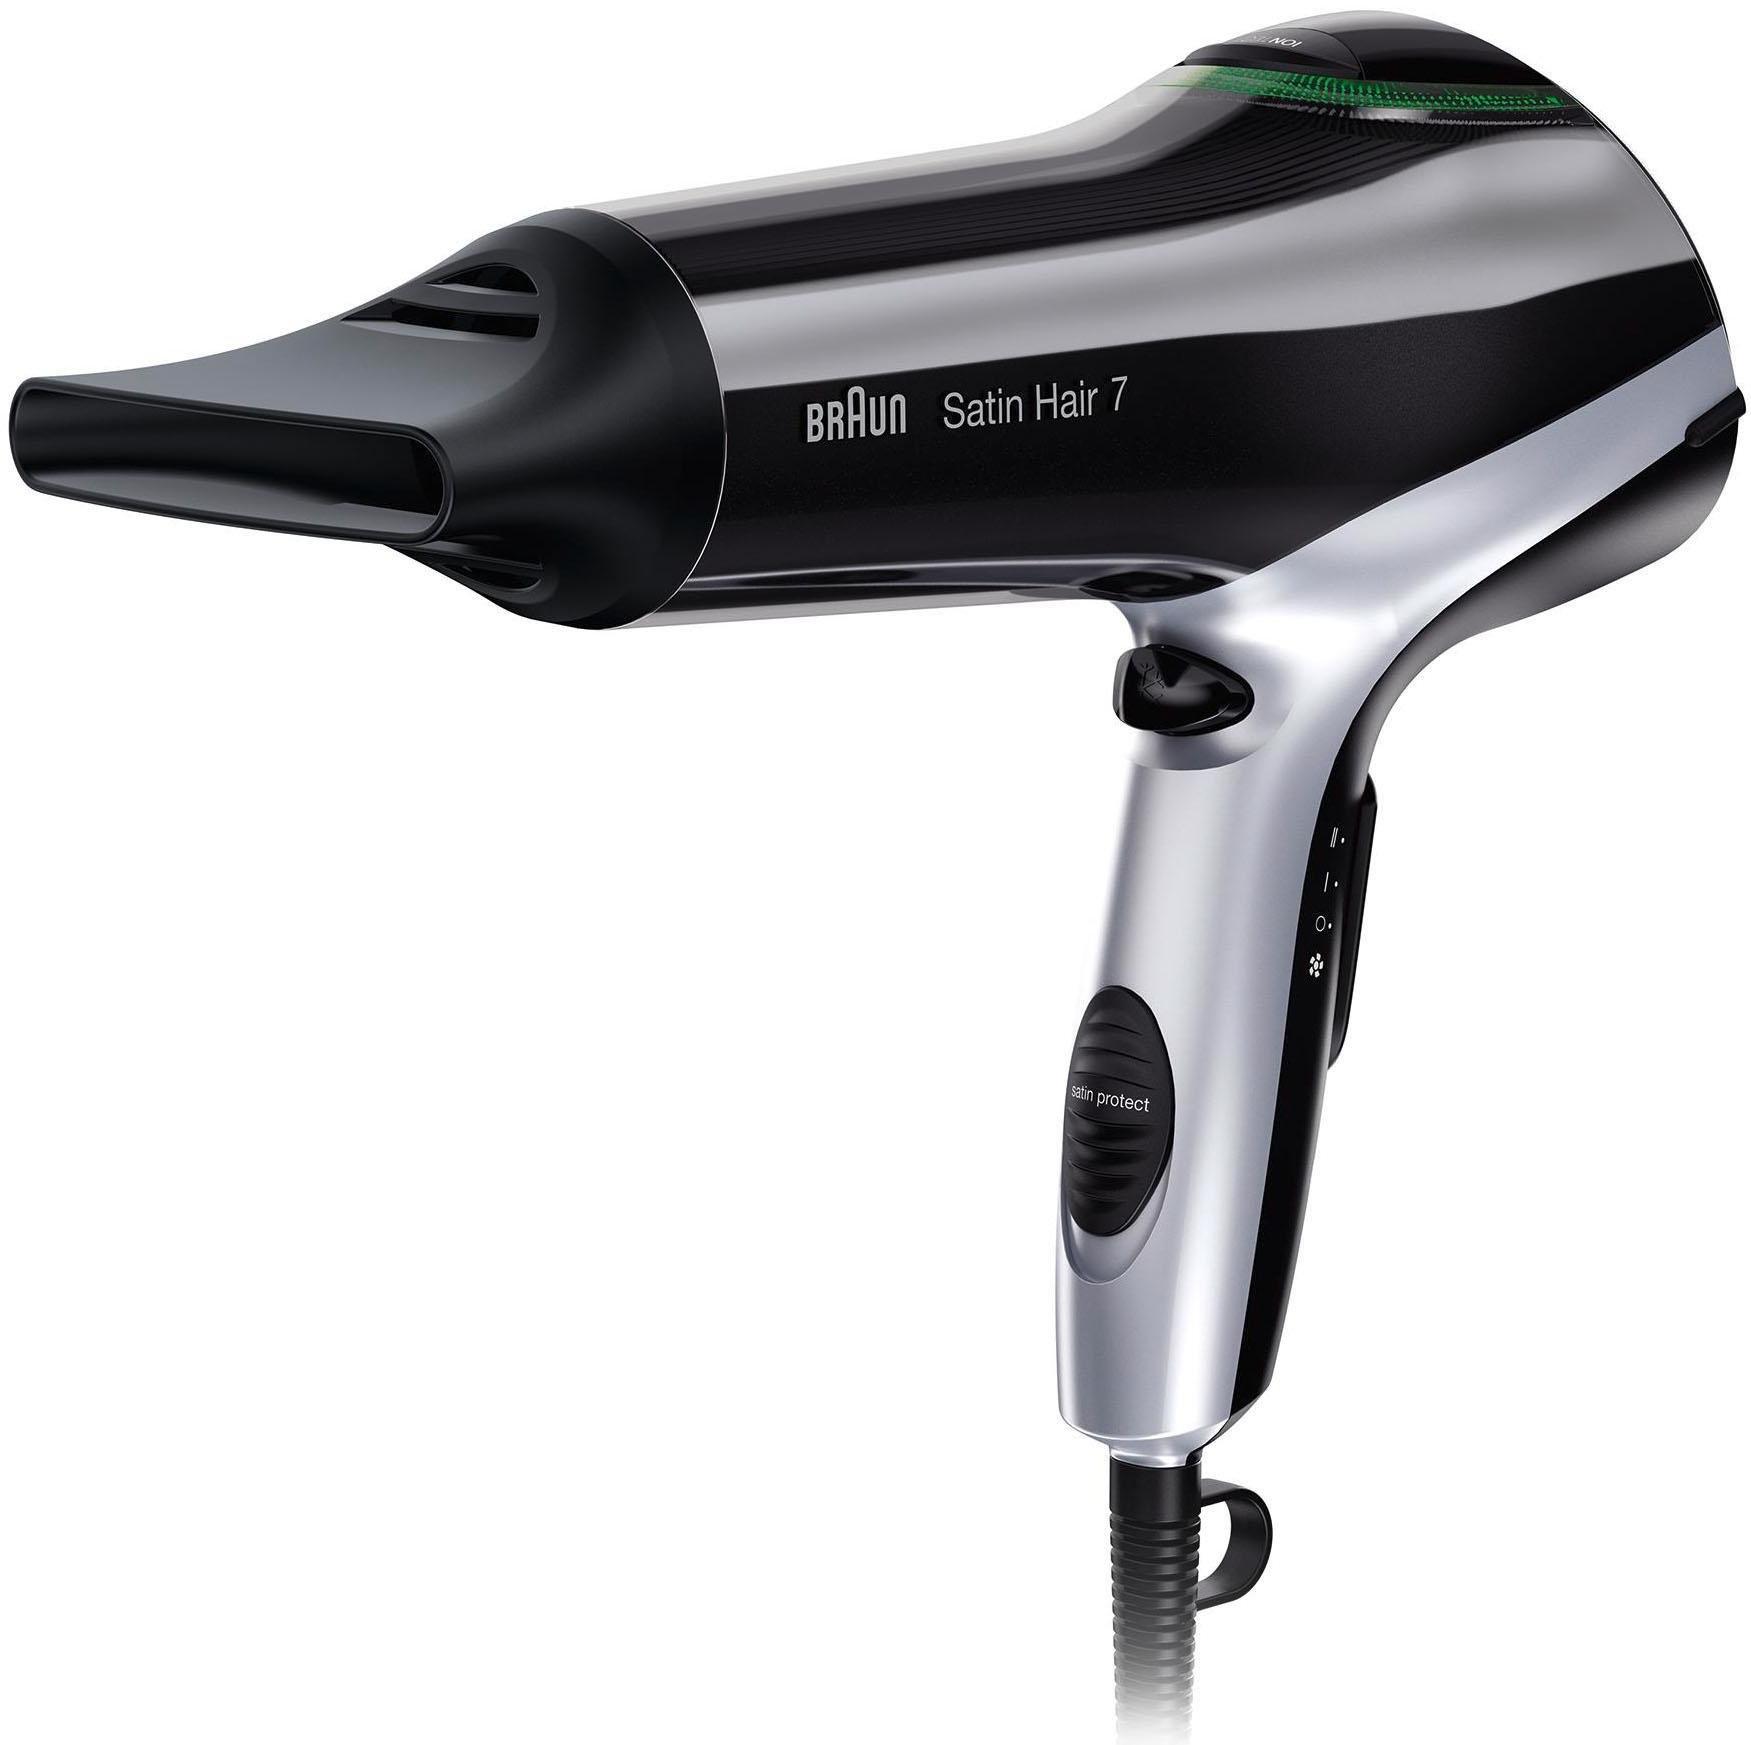 Braun Haardroger Braun Satin Hair 7 HD 710 goedkoop op otto.nl kopen